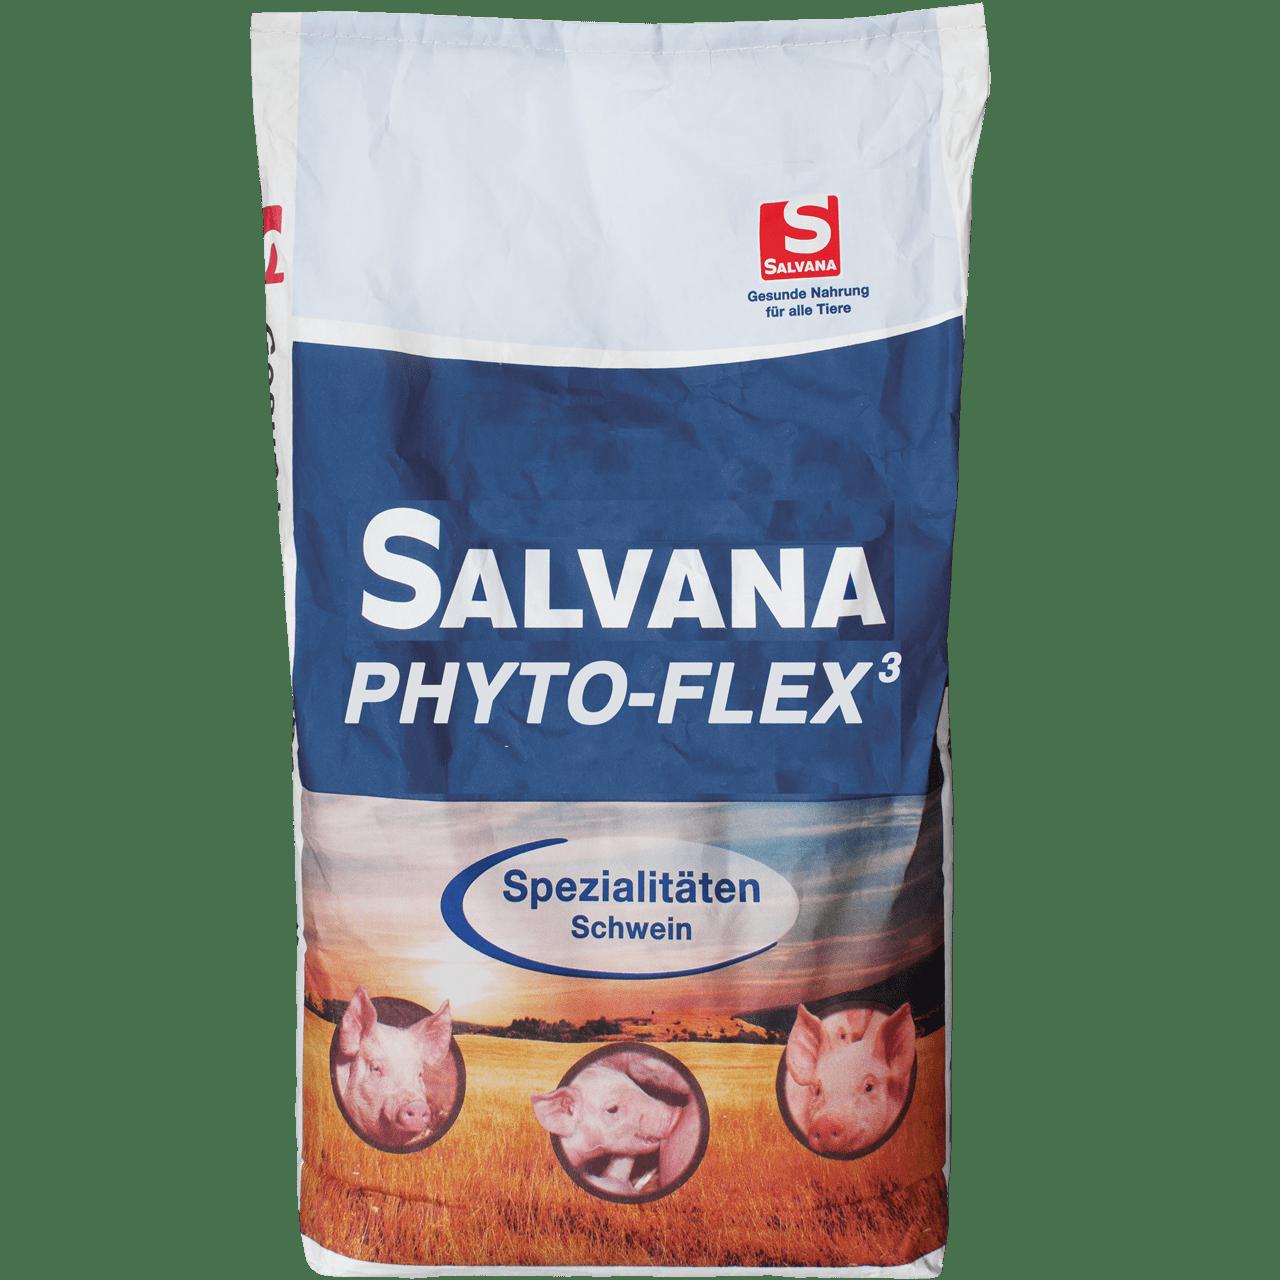 SALVANA PHYTO-FLEX